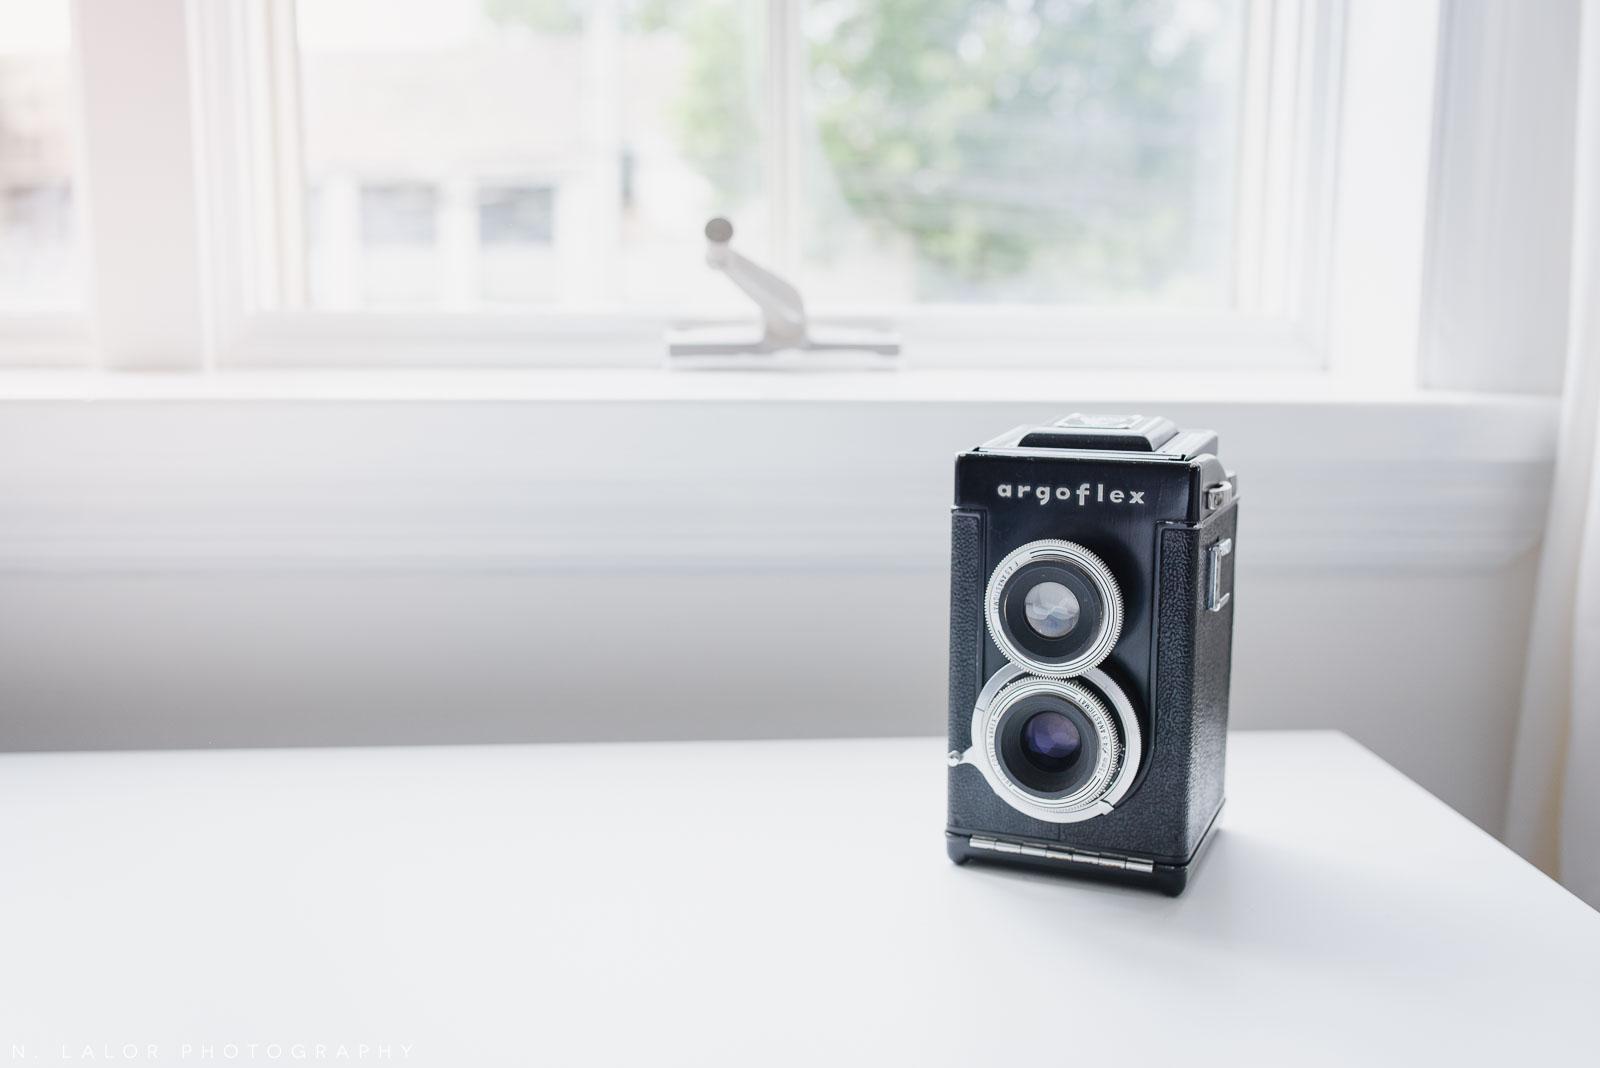 My vintage cameras finally have a home!